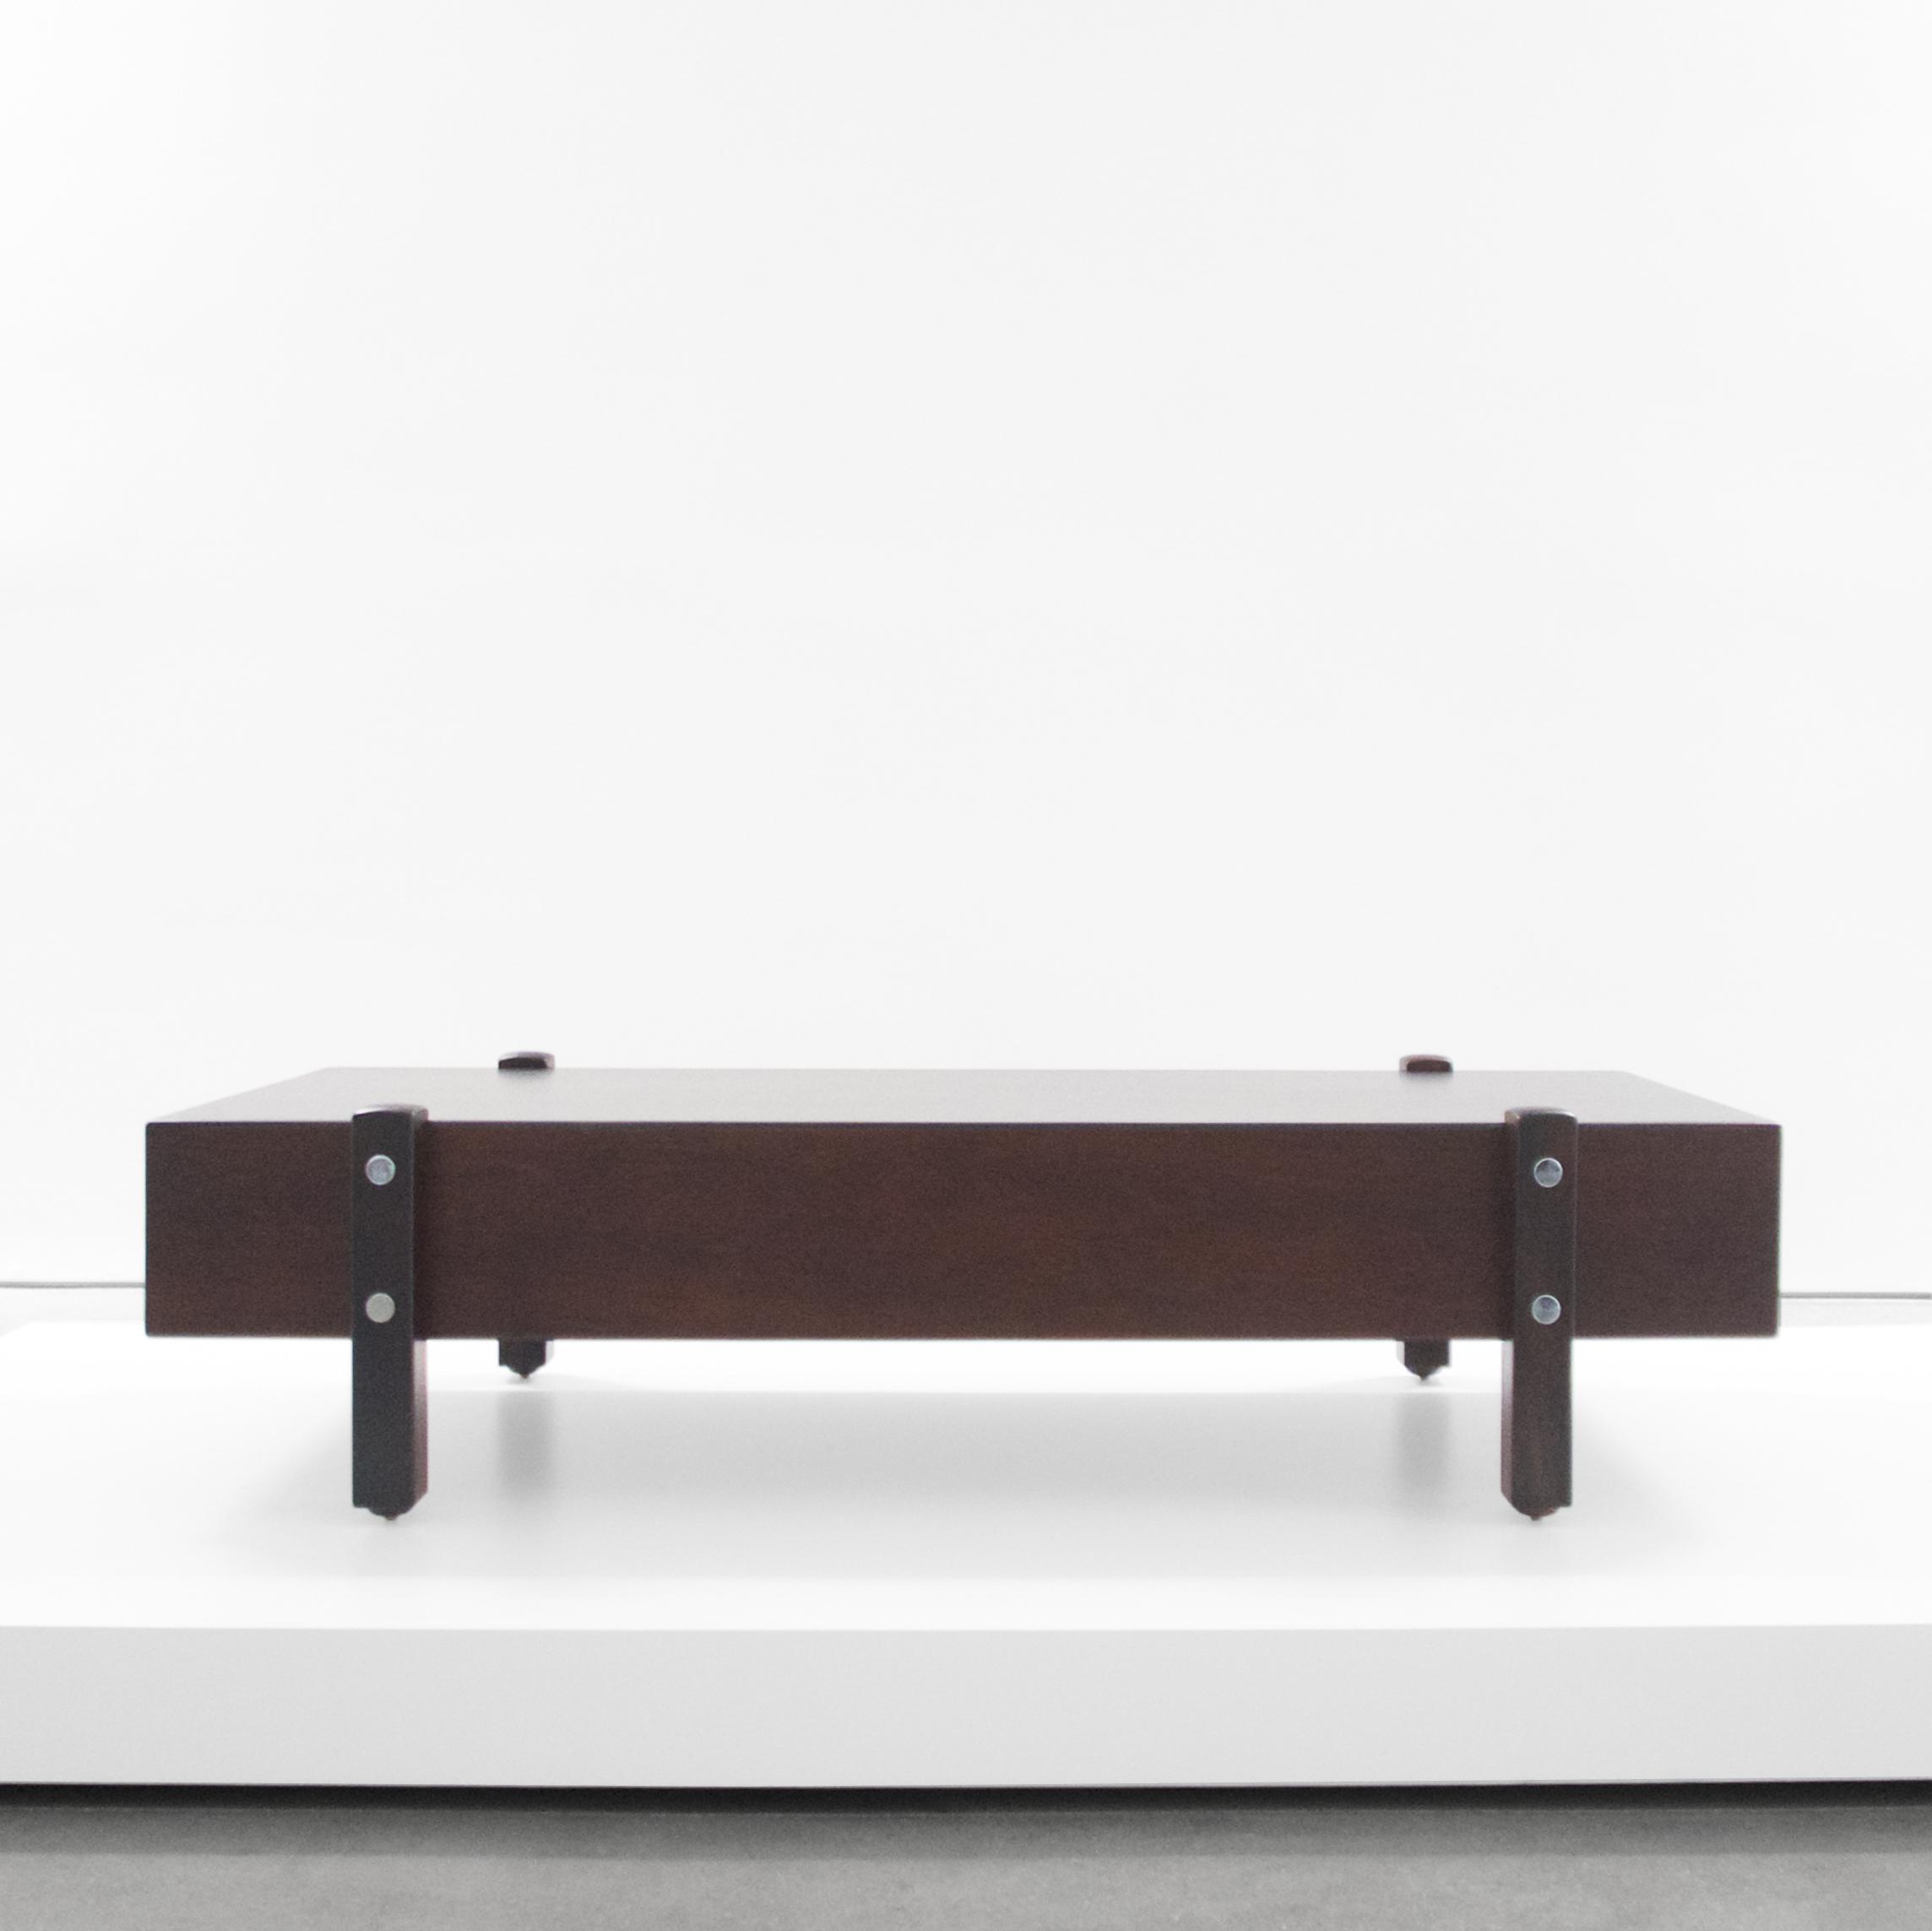 sergio rodrigues 'eleh' bench $20,000